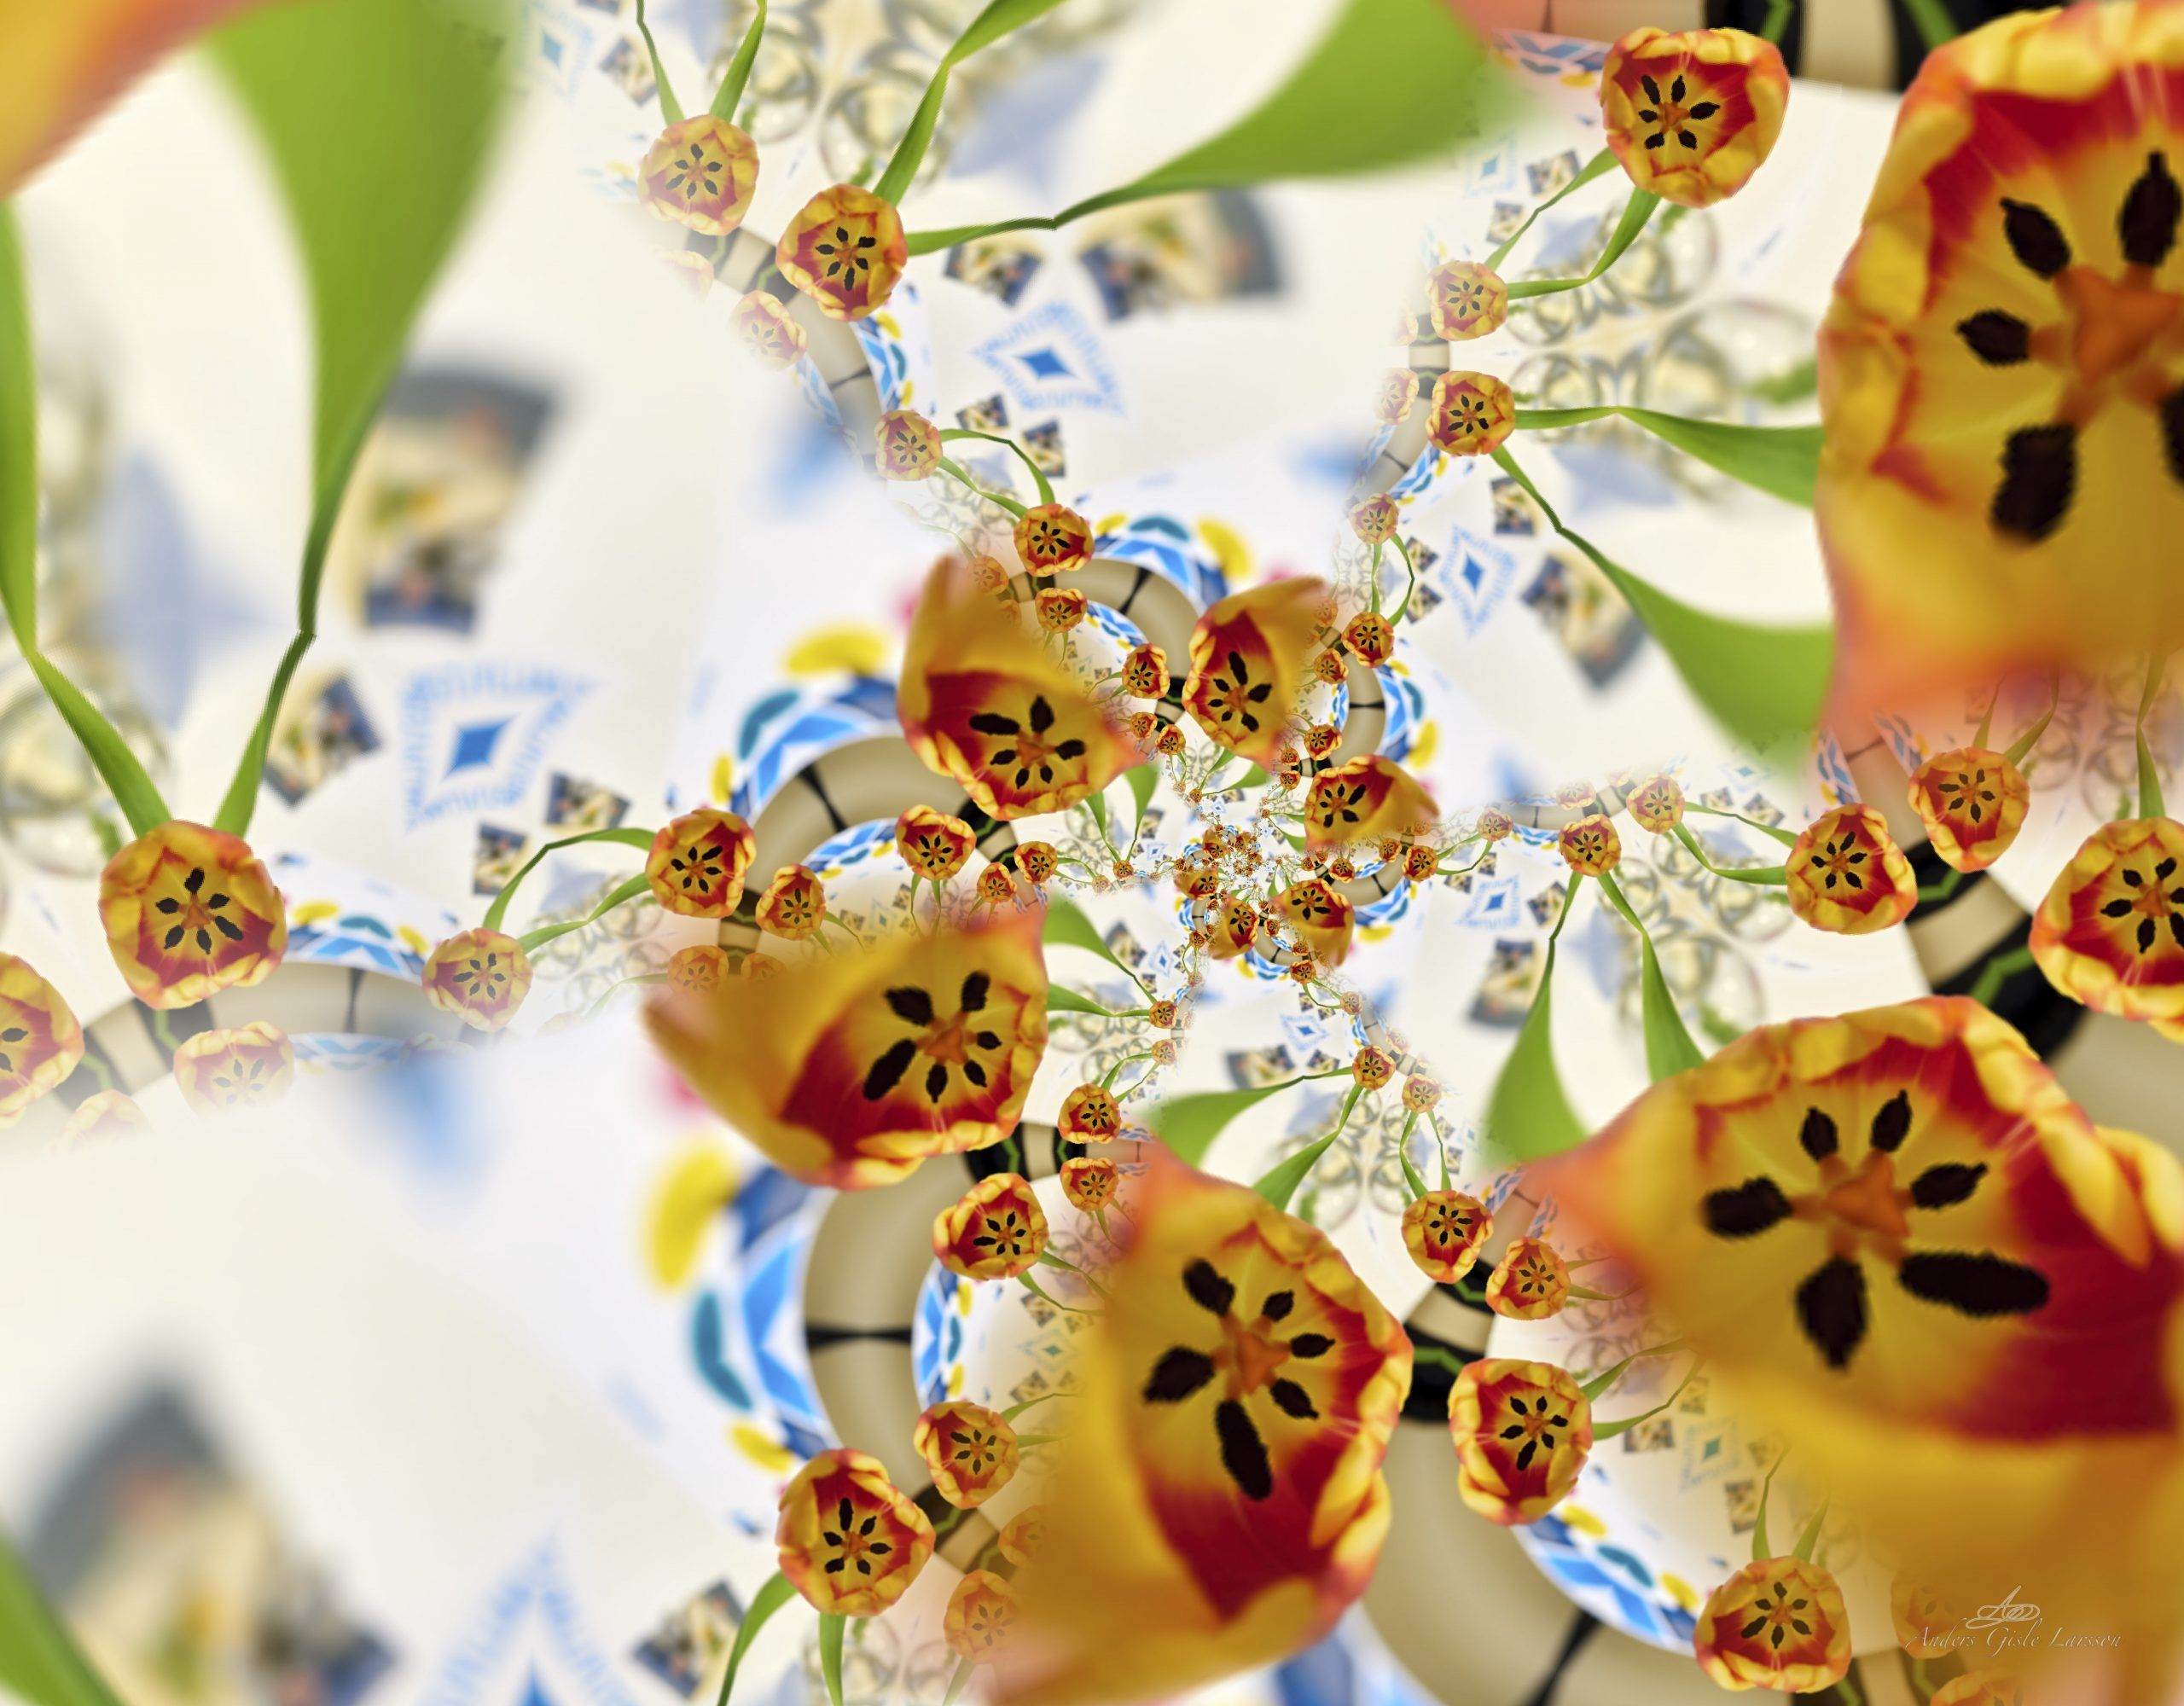 Tulipan Kaleidoskop, Uge 11, Assentoft, Randers